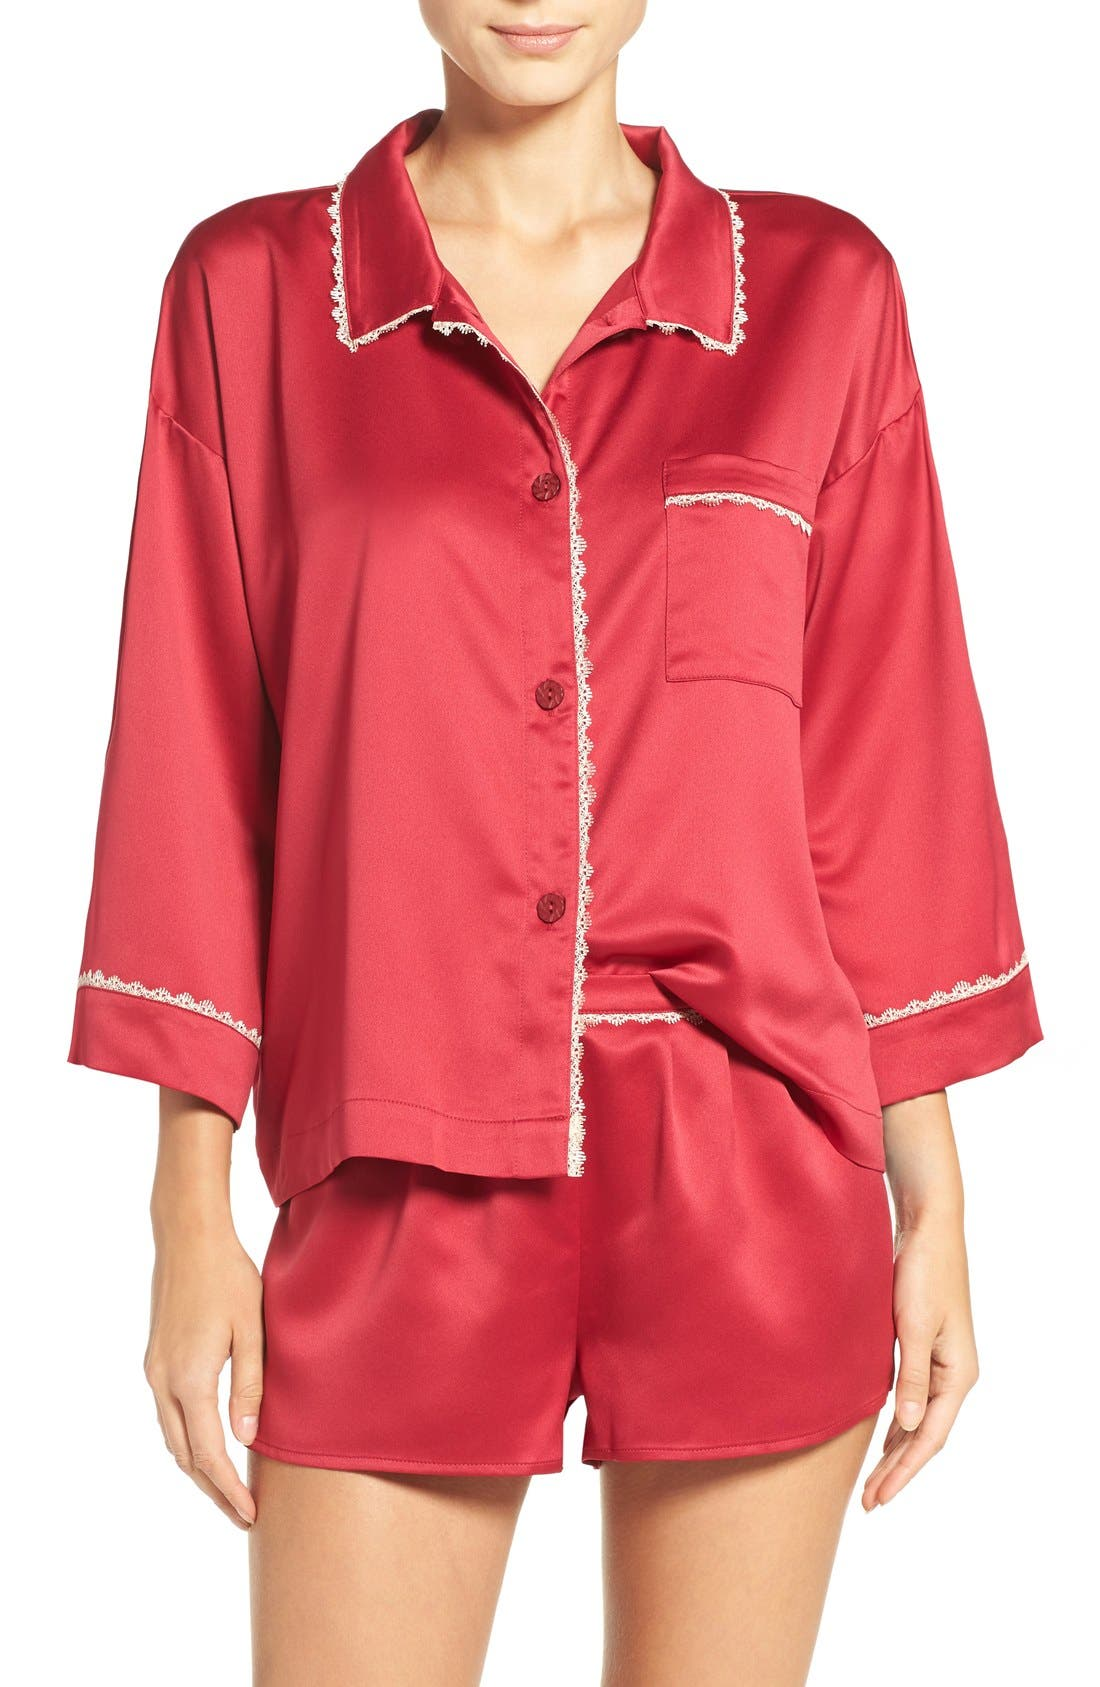 Wisteria Satin Pajamas,                         Main,                         color, Cranberry